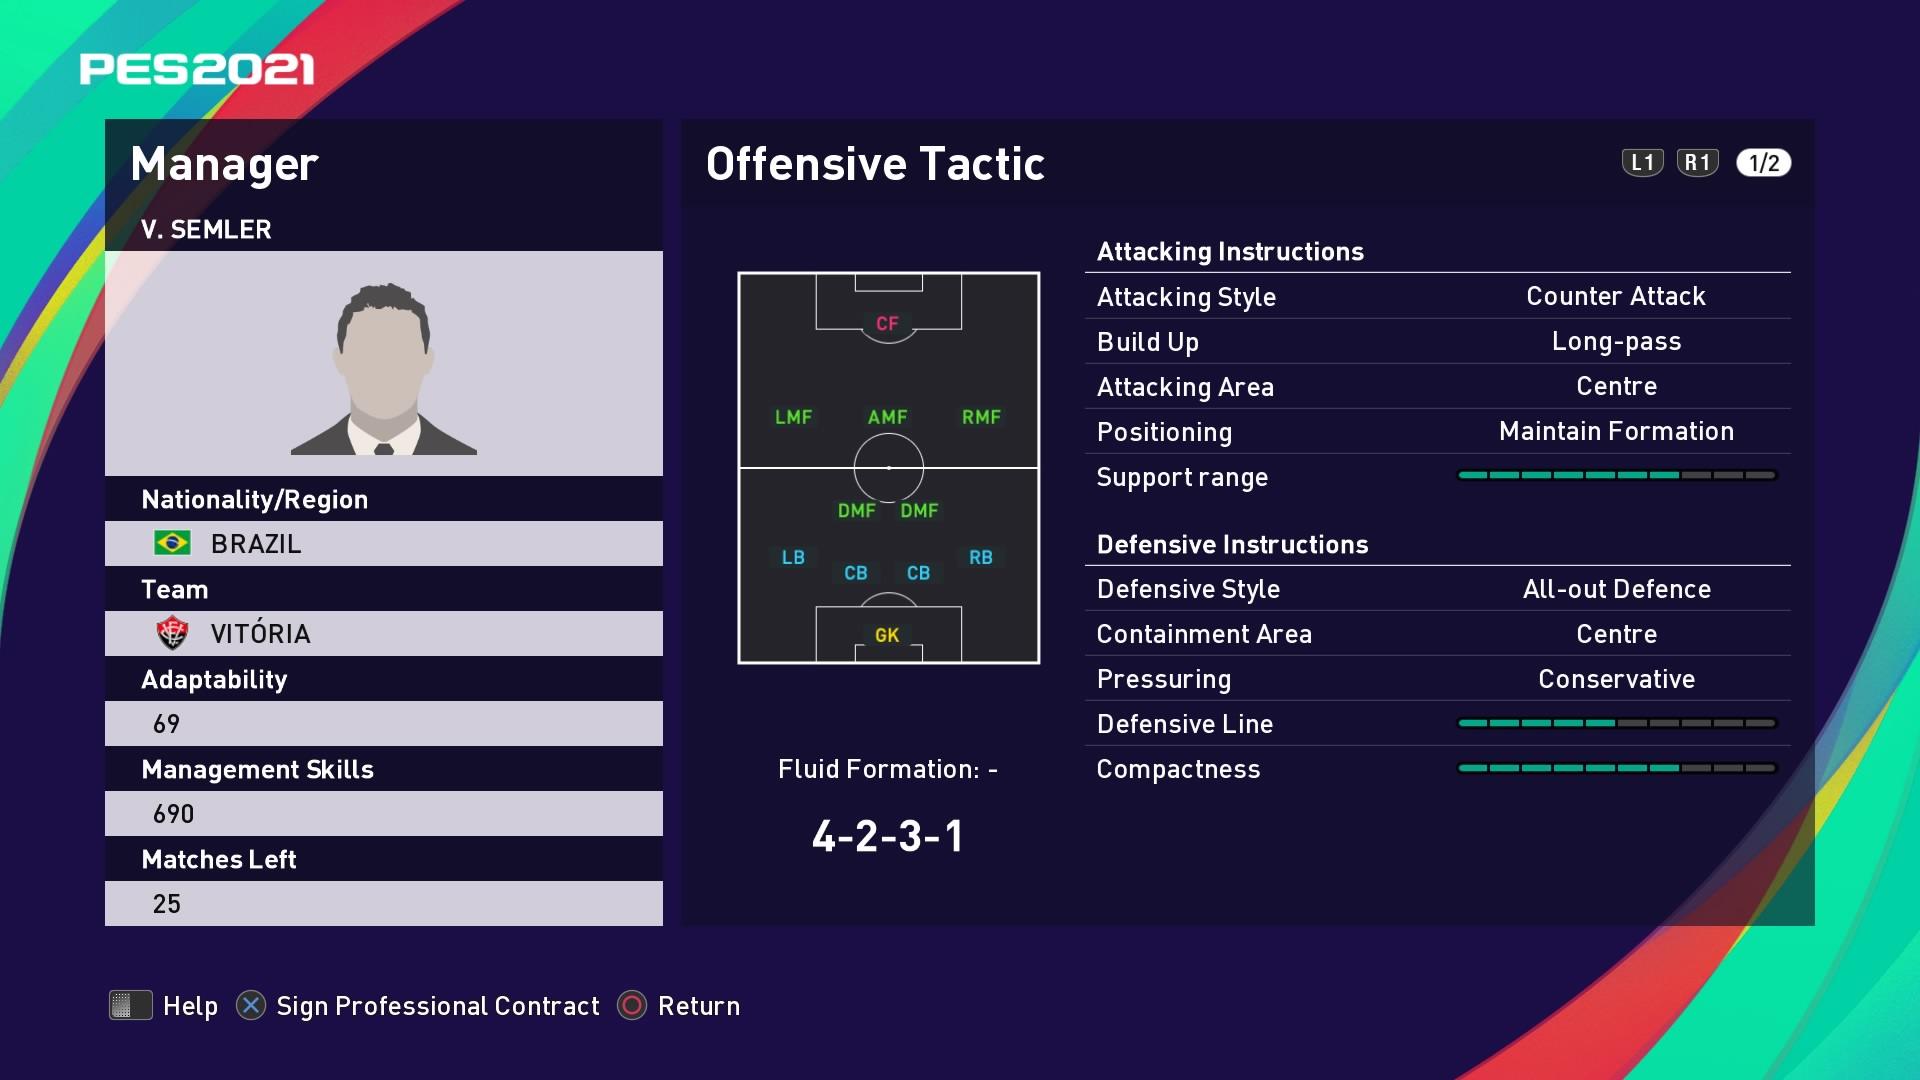 V. Semler (Bruno Pivetti) Offensive Tactic in PES 2021 myClub